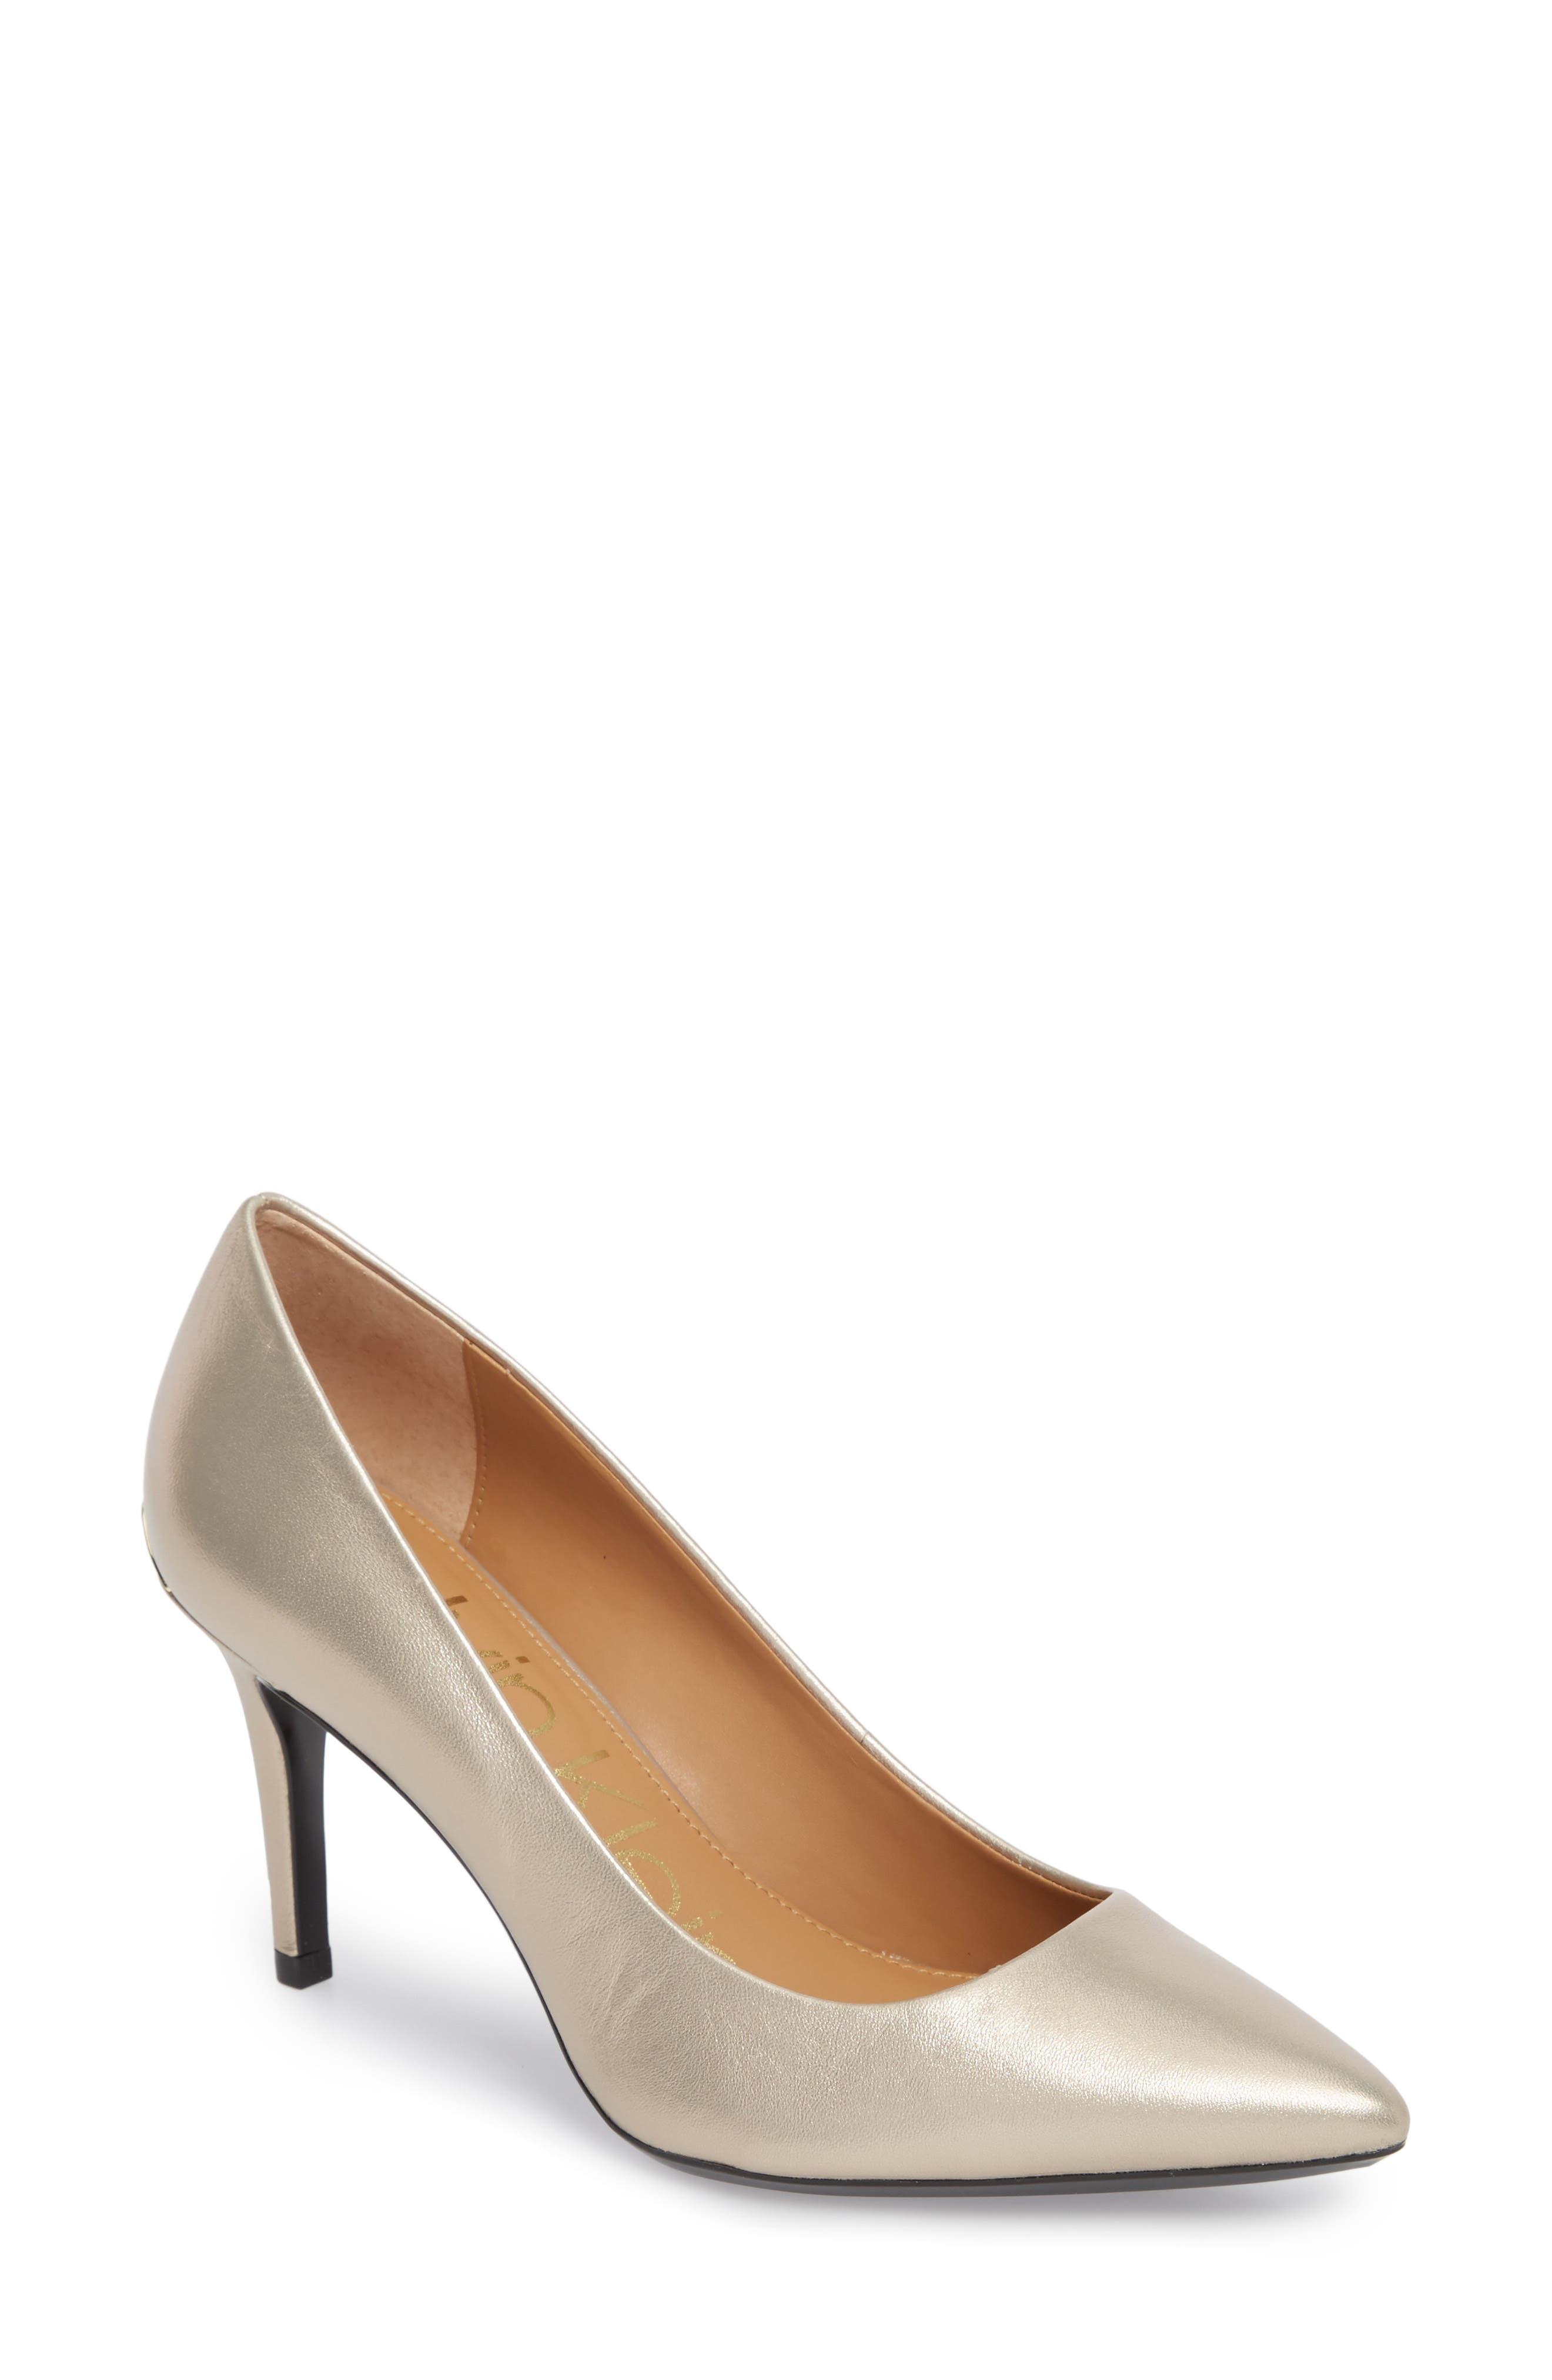 Alternate Image 1 Selected - Calvin Klein 'Gayle' Pointy Toe Pump (Women)